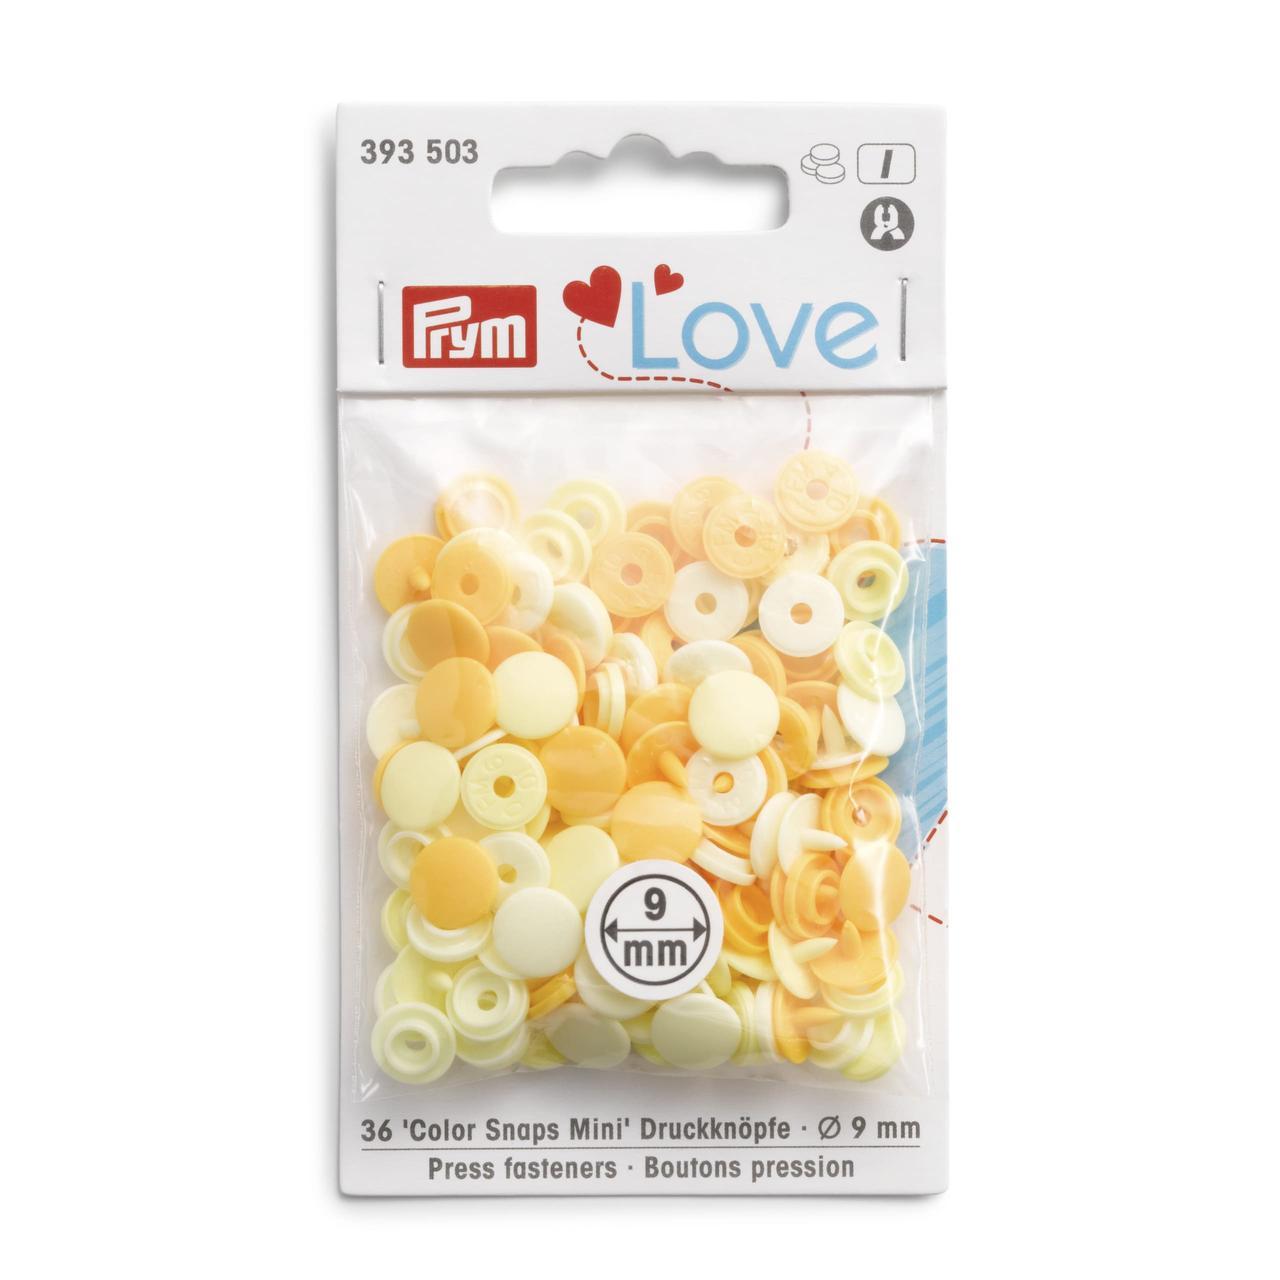 Непришивные кнопки «Color Snaps Mini», 9 мм, цвета желтые Prym Love 393503